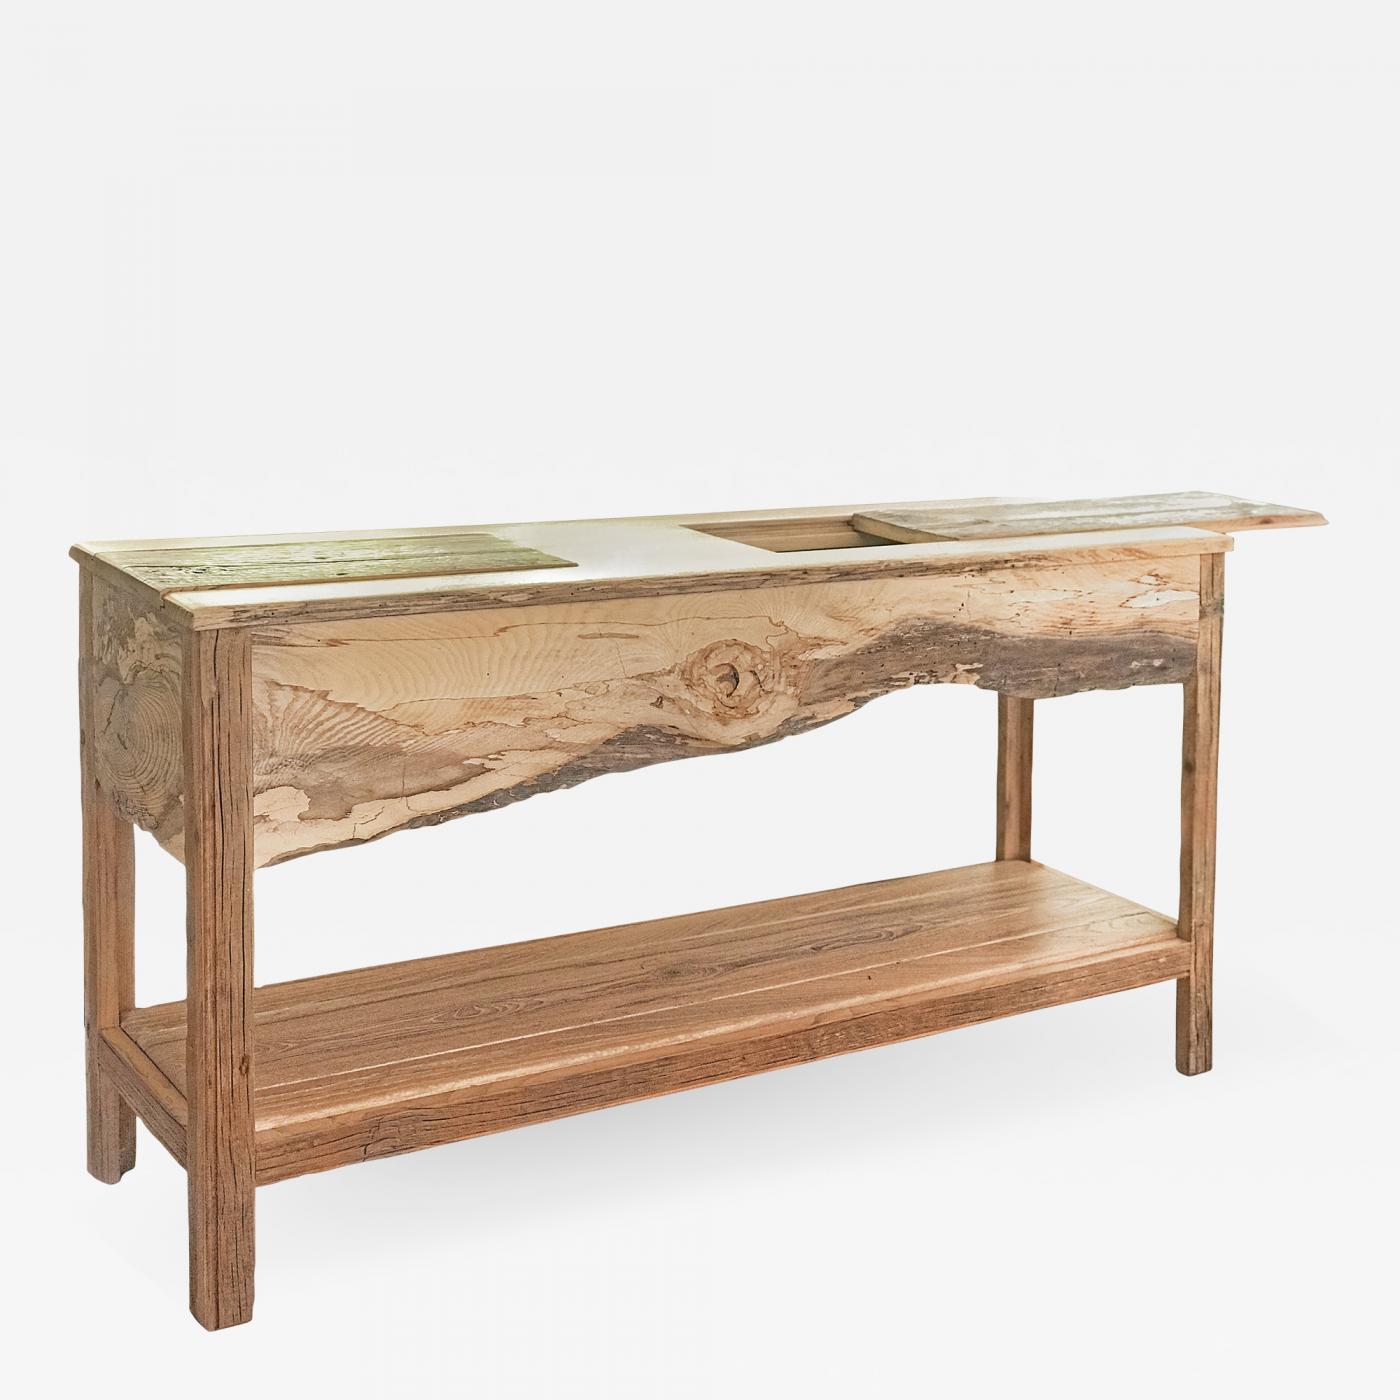 Remarkable William Alburger Console Sofa Entry Table Bespoke Wood Eco Sculpture Landscape Pabps2019 Chair Design Images Pabps2019Com